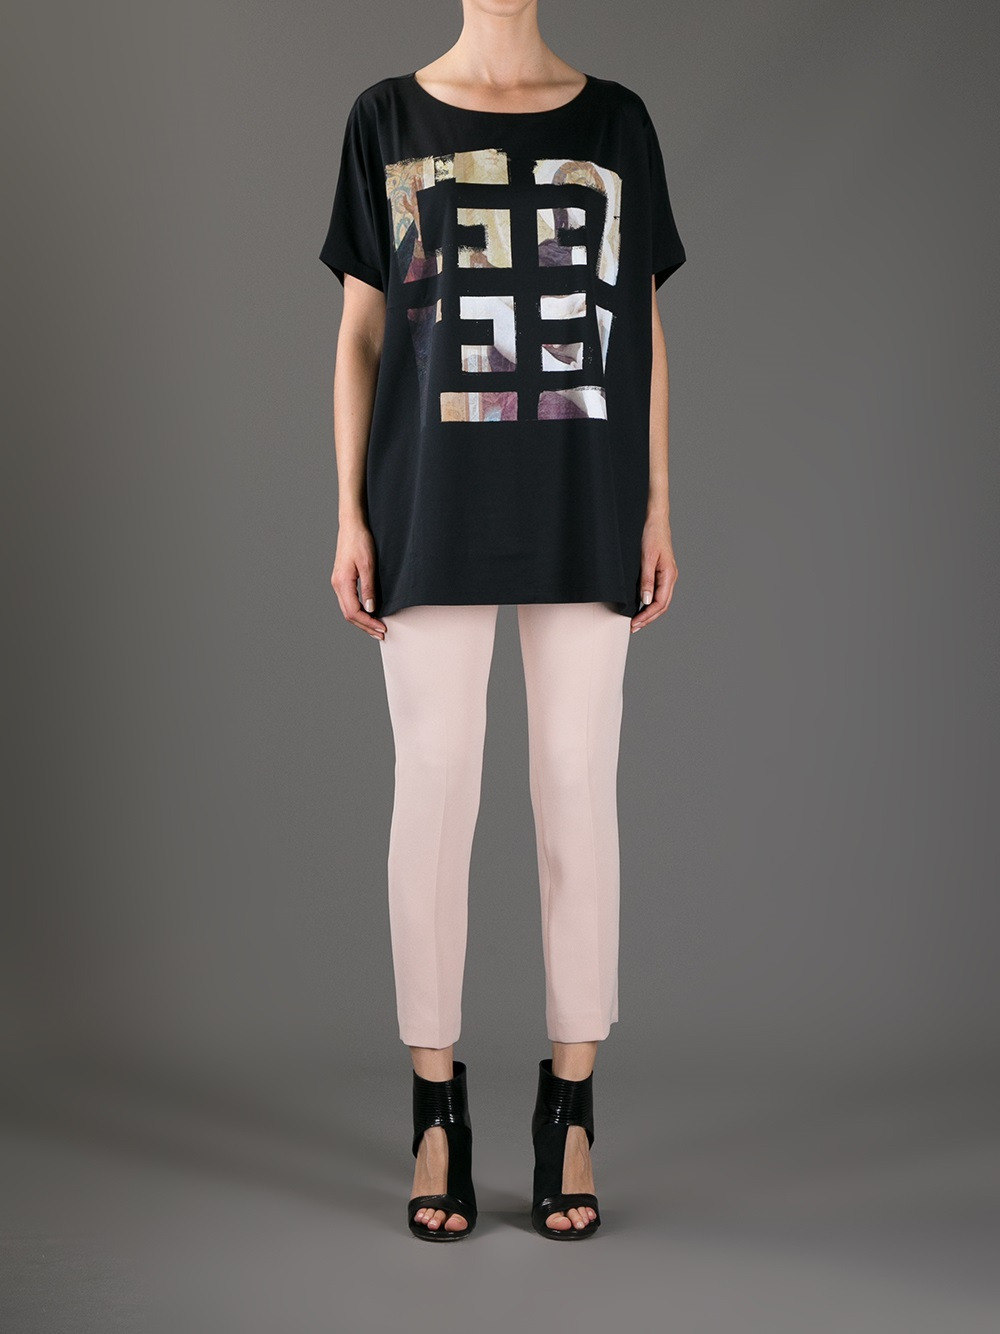 Designer T Shirts Women